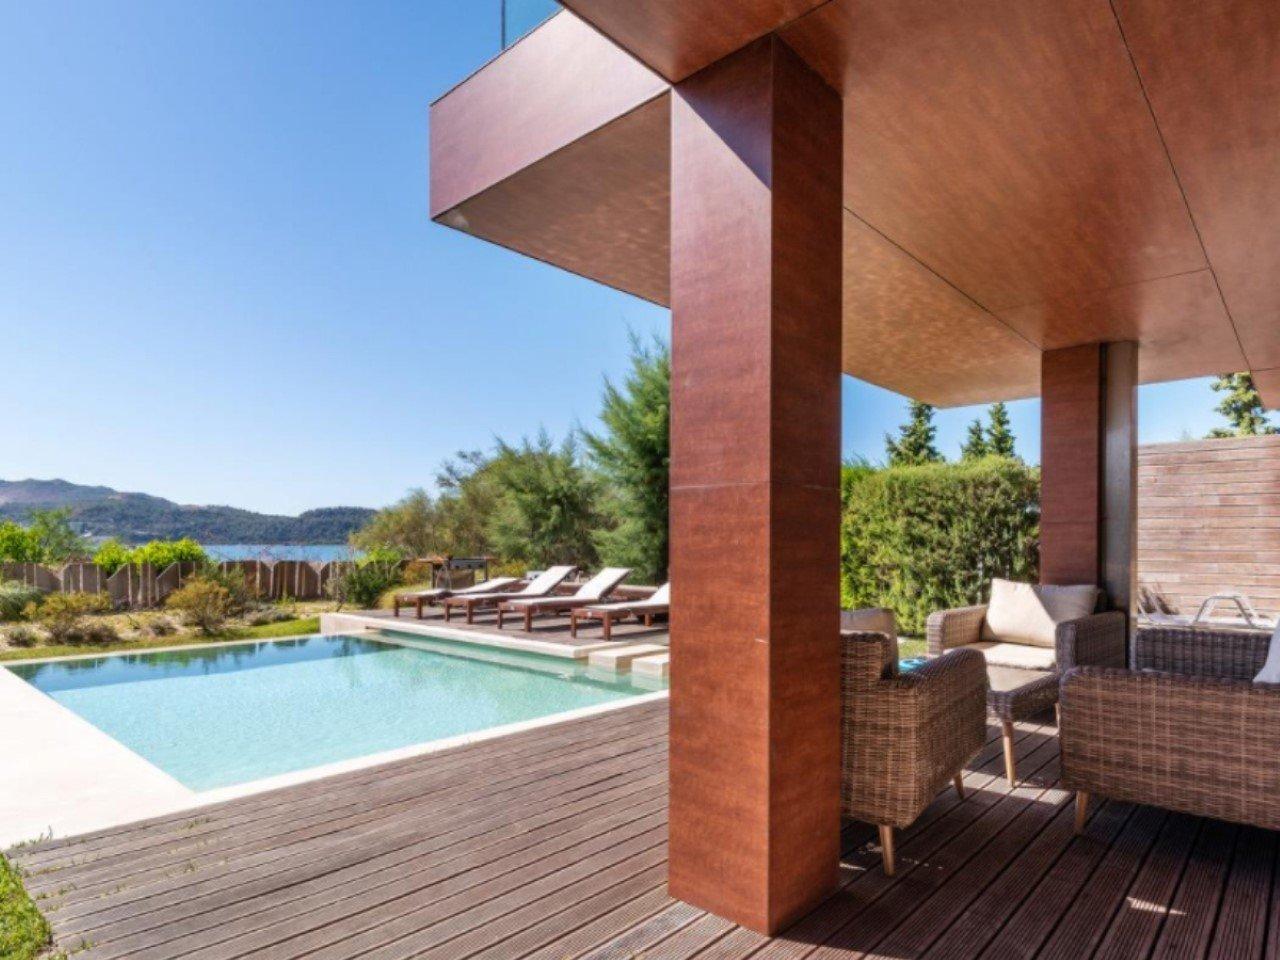 2 Bedroom Apartment Setubal, Lisbon Ref: AMA14000